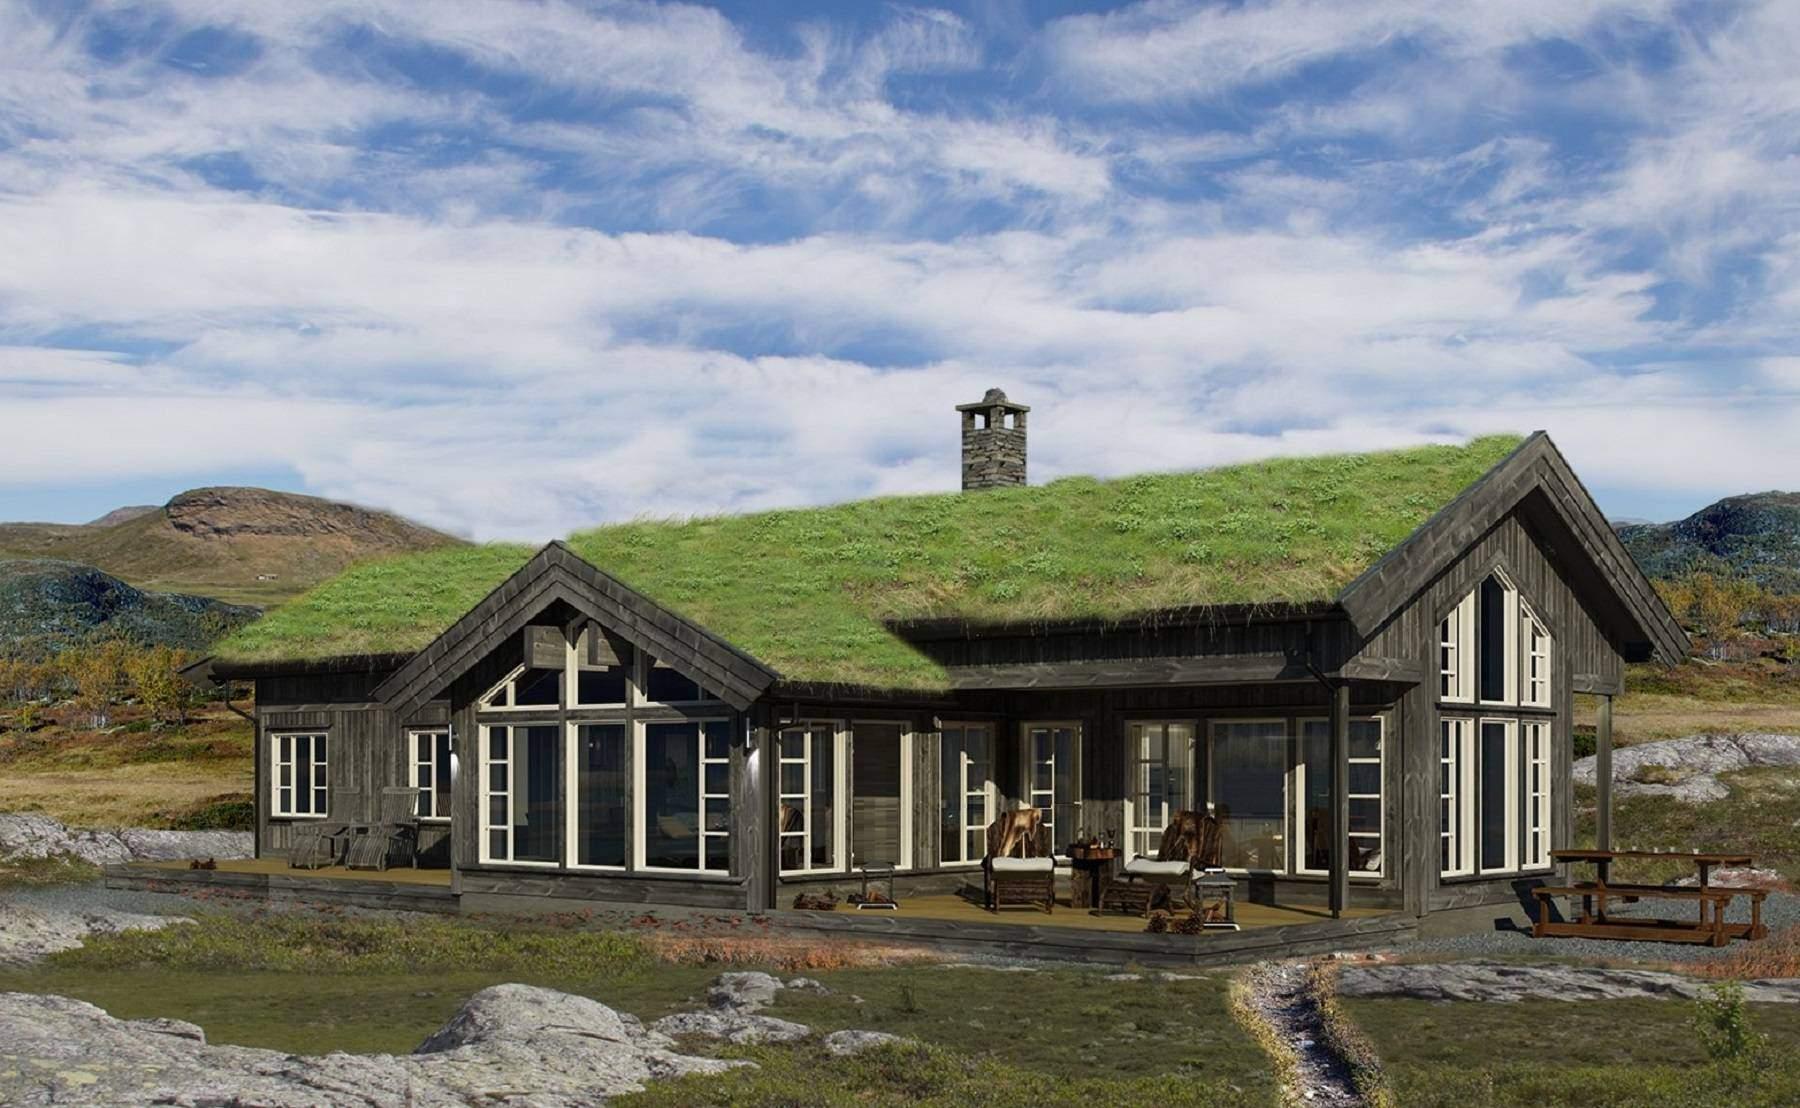 16 Strynsfjell 122 Fasade